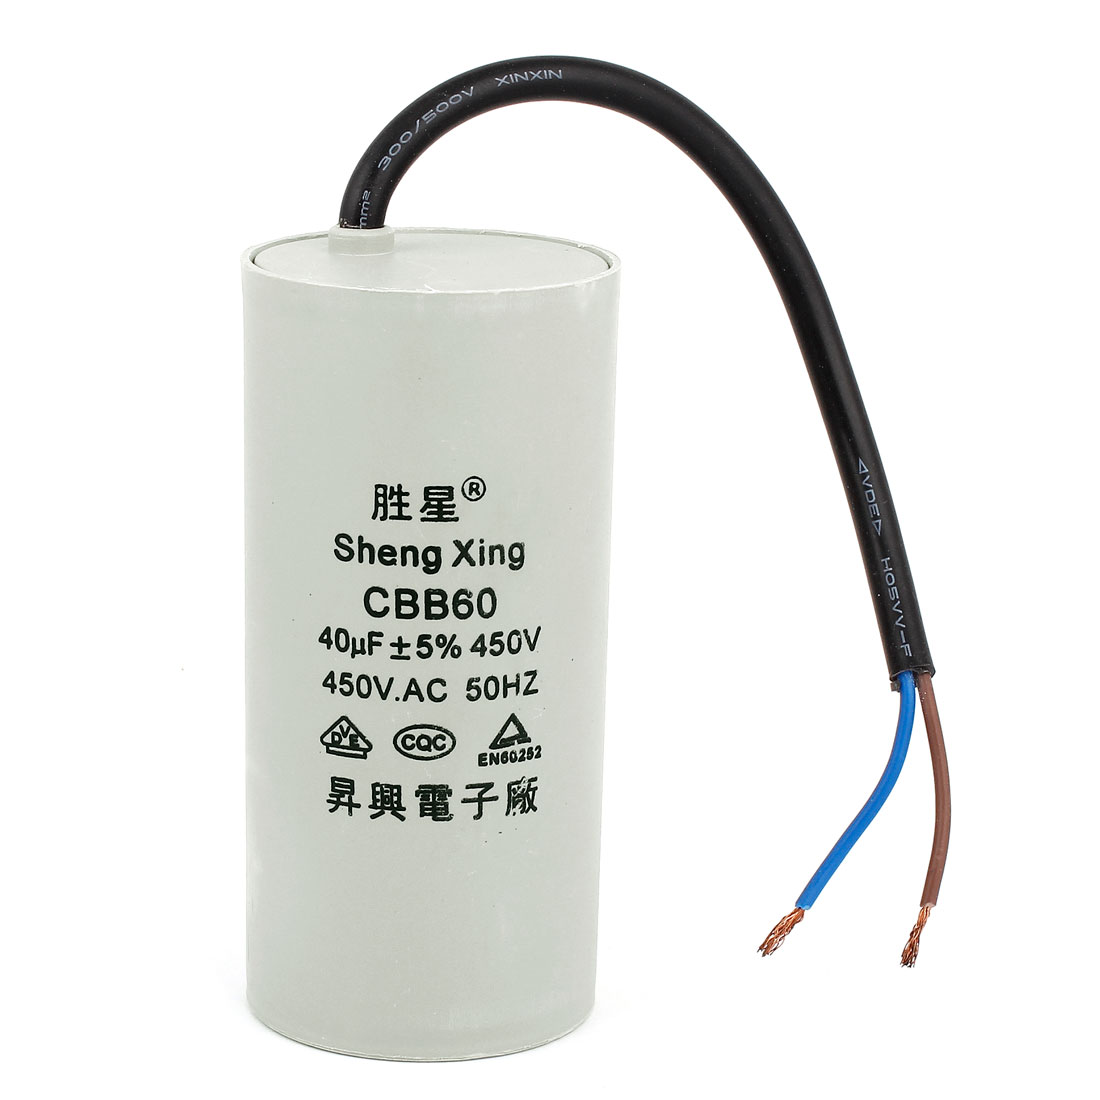 CBB60 40uF Washing Machine Polypropylene Film Motor Capacitor